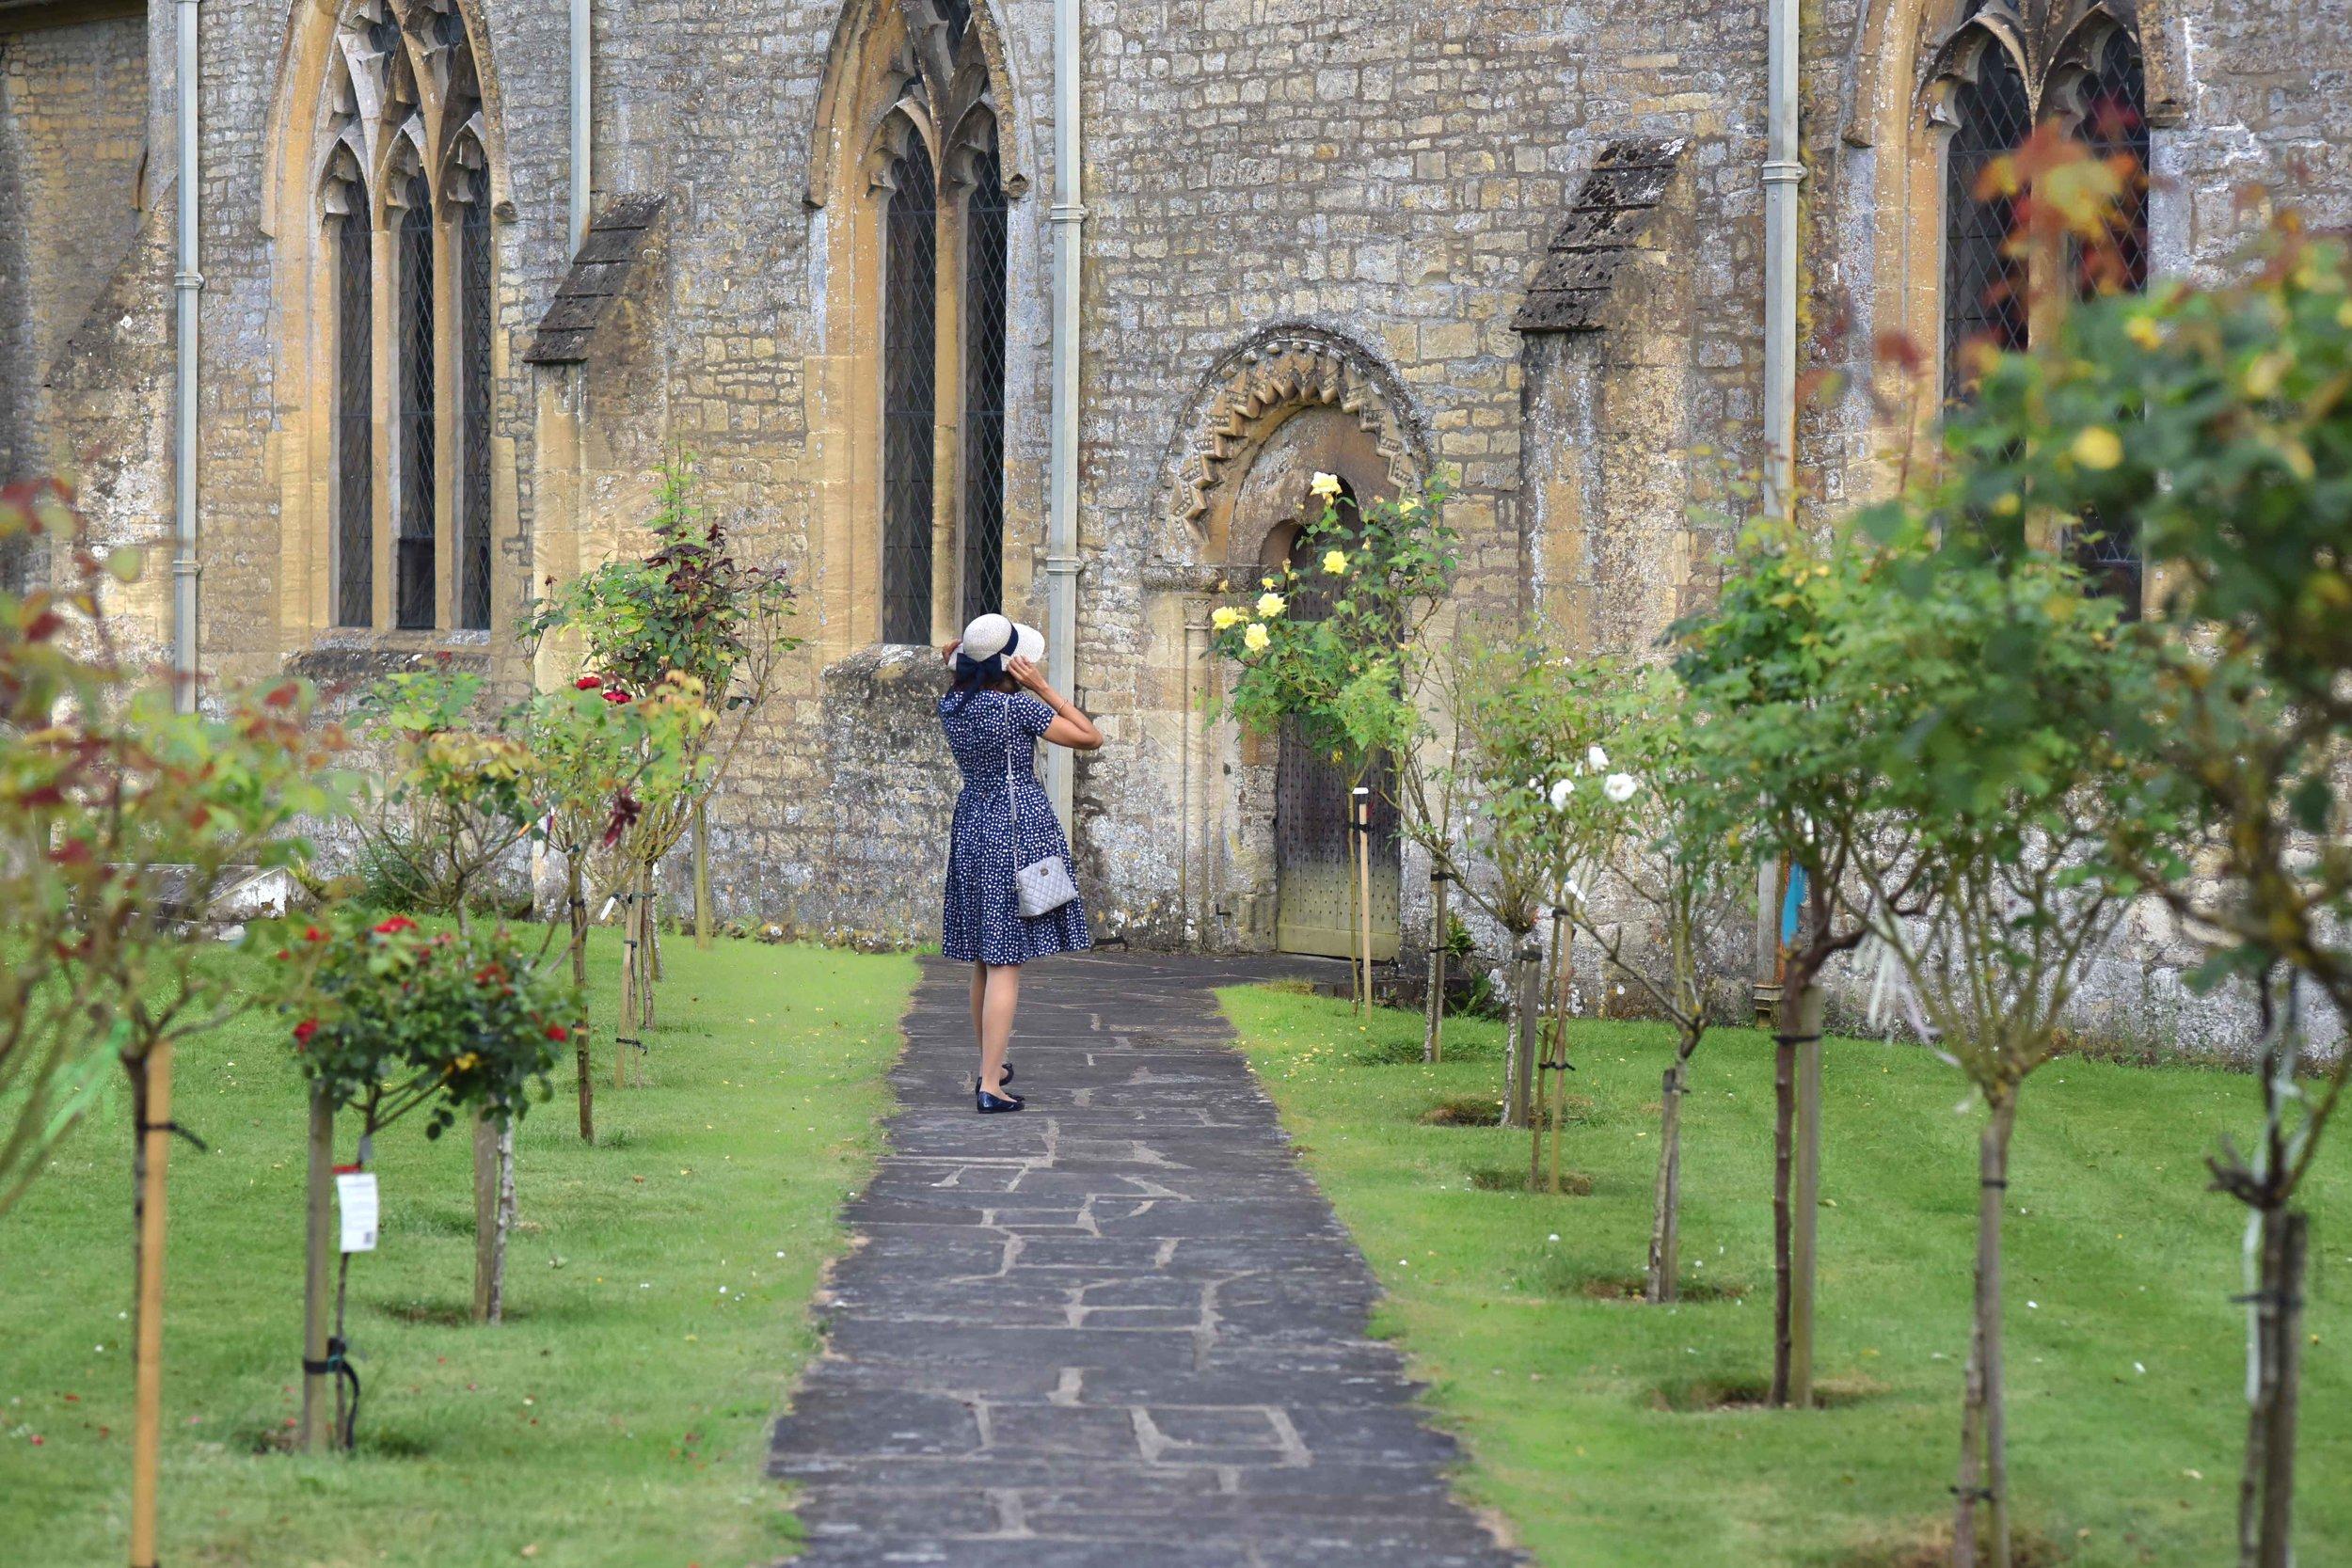 Prada dress, Saint Mary's church, Bibury, Cotswold, England. Image©sourcingstyle.com